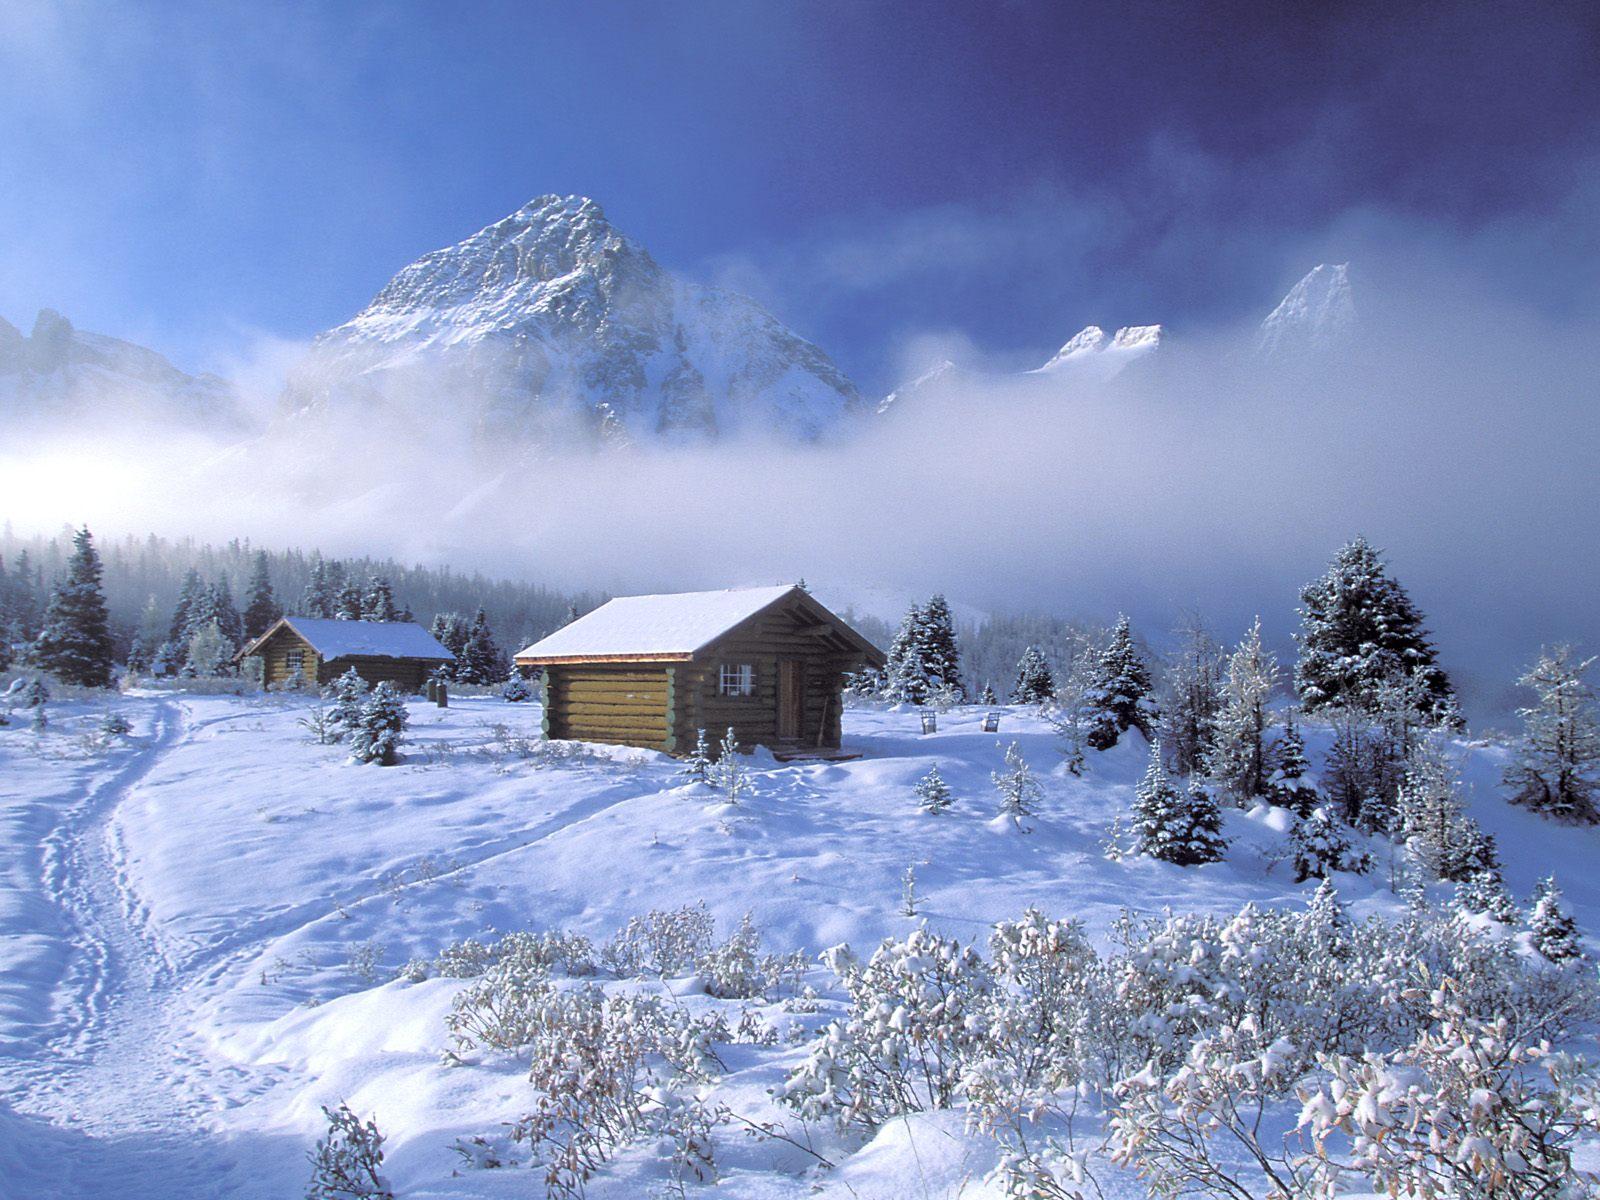 Assassins Creed Wallpaper Hd 1080p Winter Wallpapers Blu Ray Wallpapers 2012 1080p